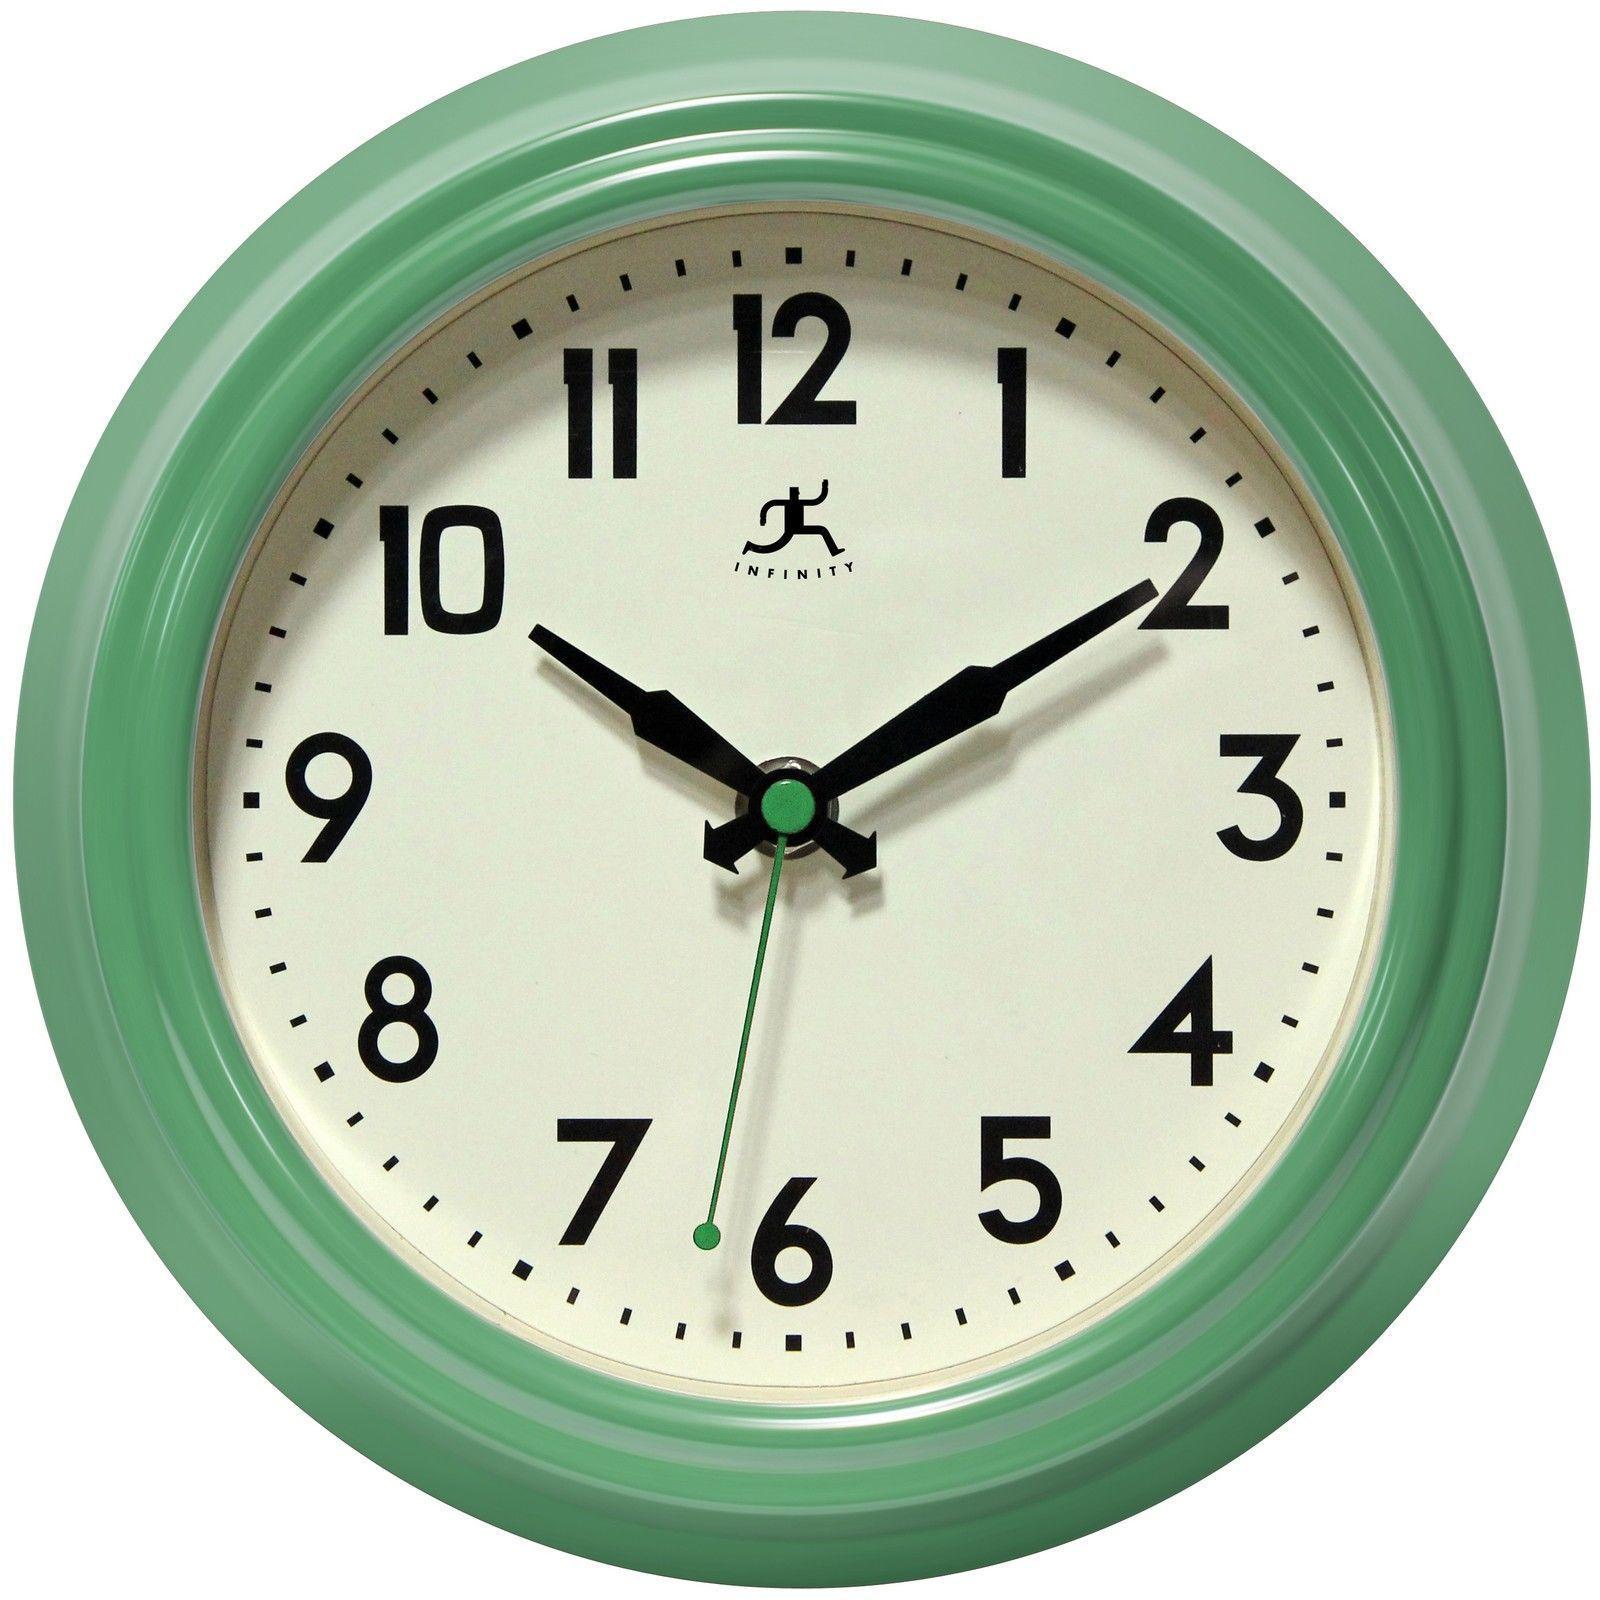 Green Kitchen Wall Clock Round Gl Face Quartz Battery Ed Home Decor